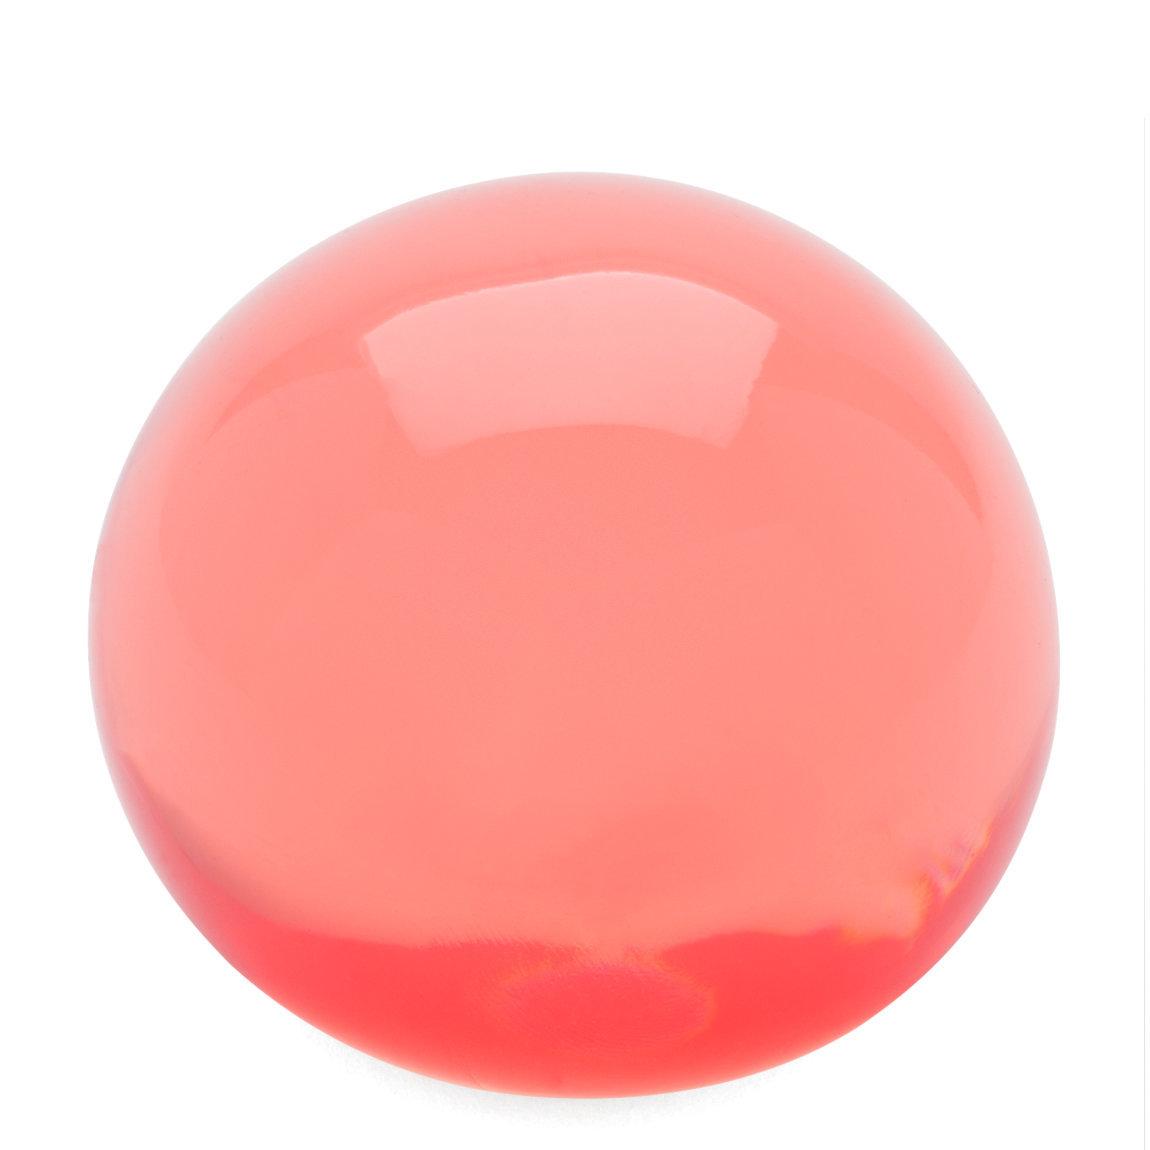 boscia Jelly Ball Cleanser Tsubaki